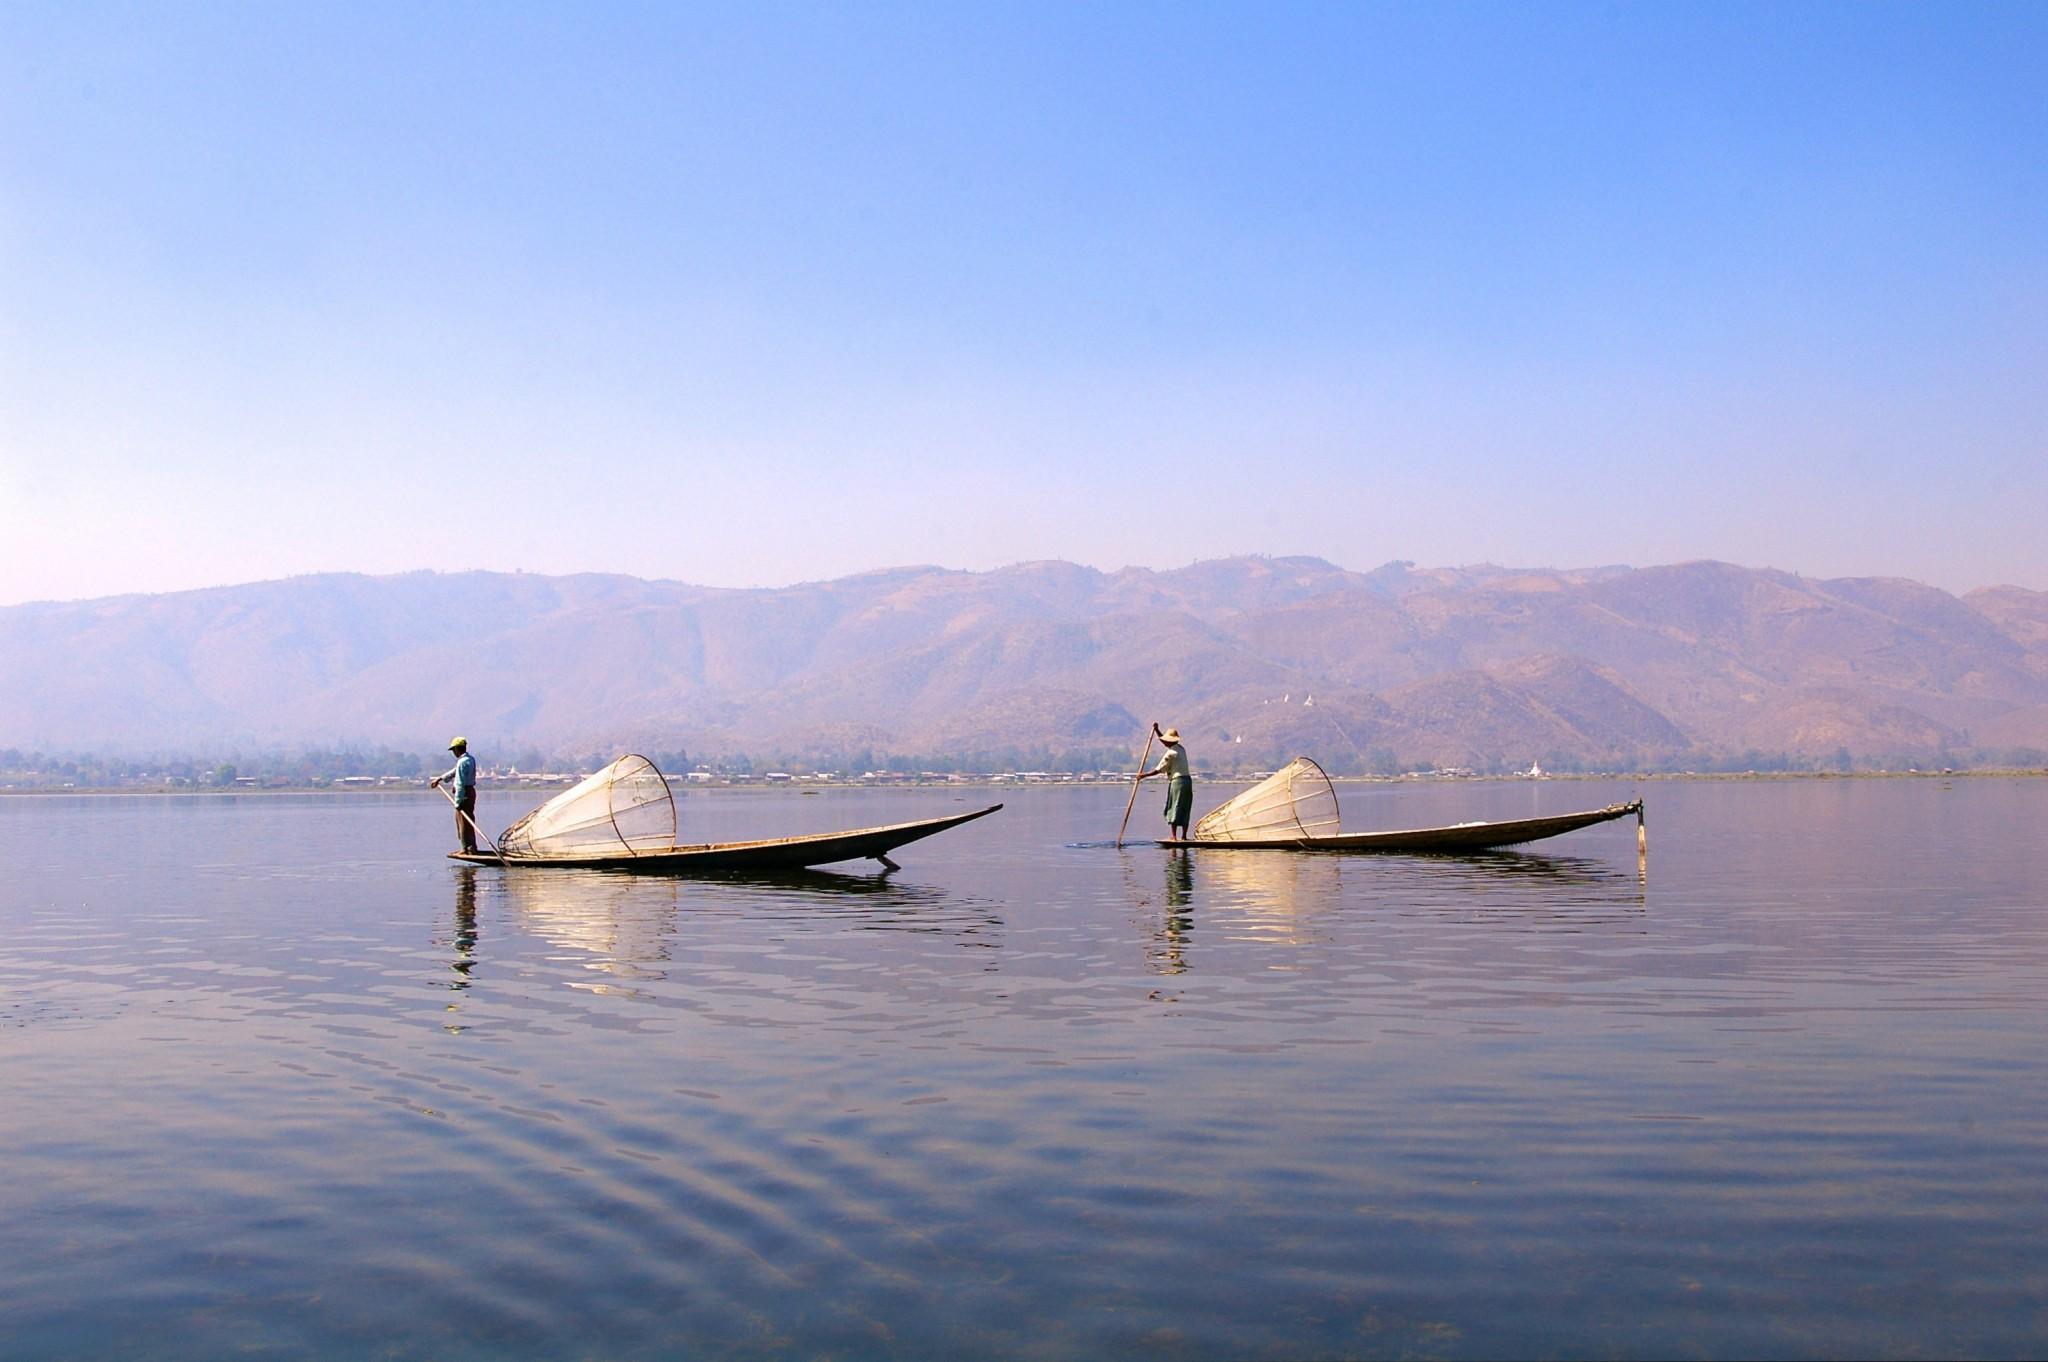 One-leg rowers on Inle Lake